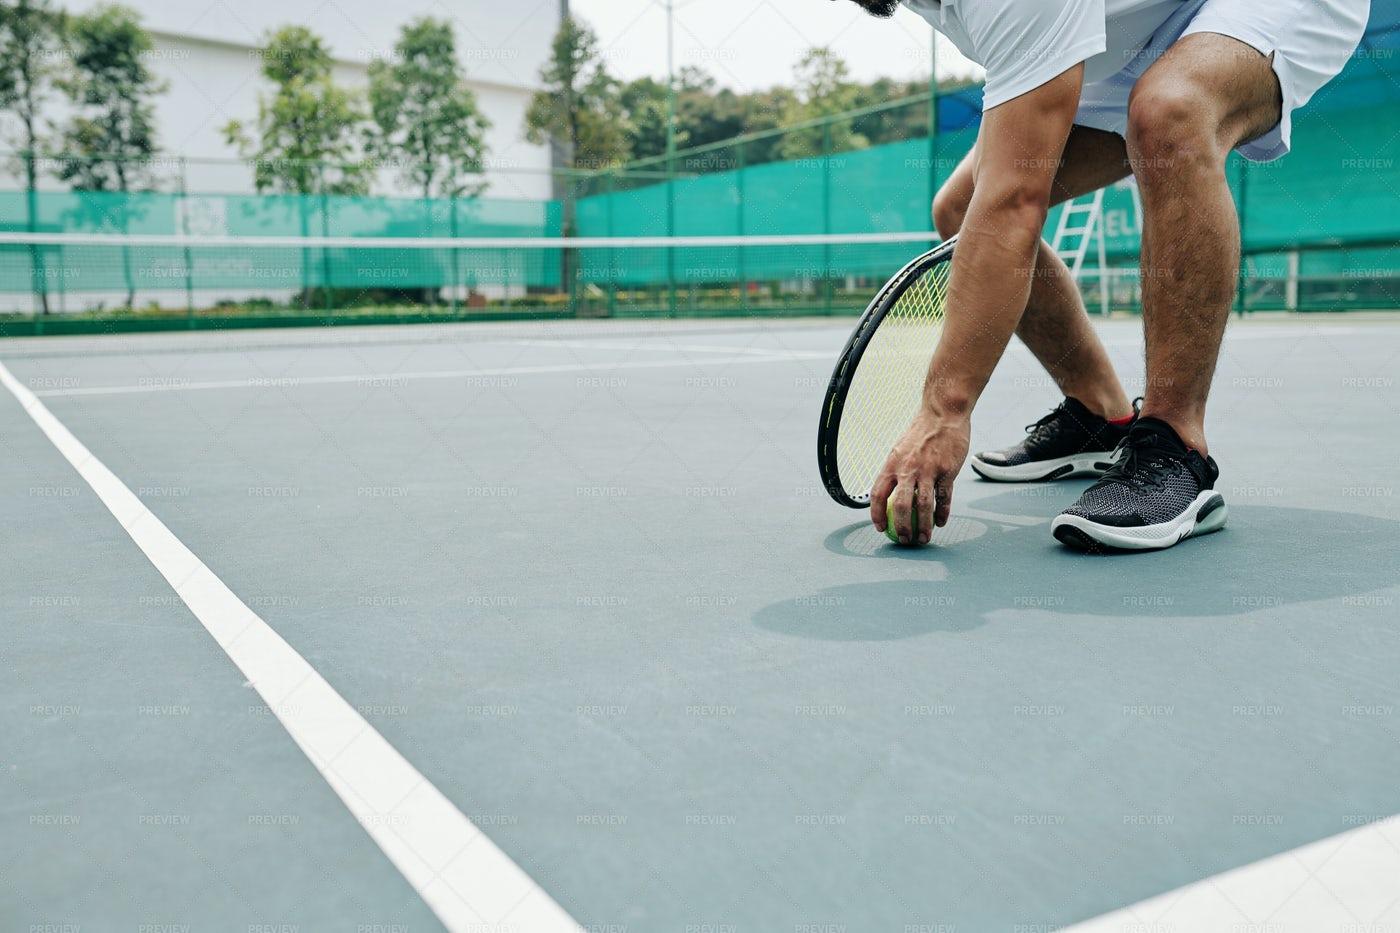 Tennis Player Taking Ball: Stock Photos